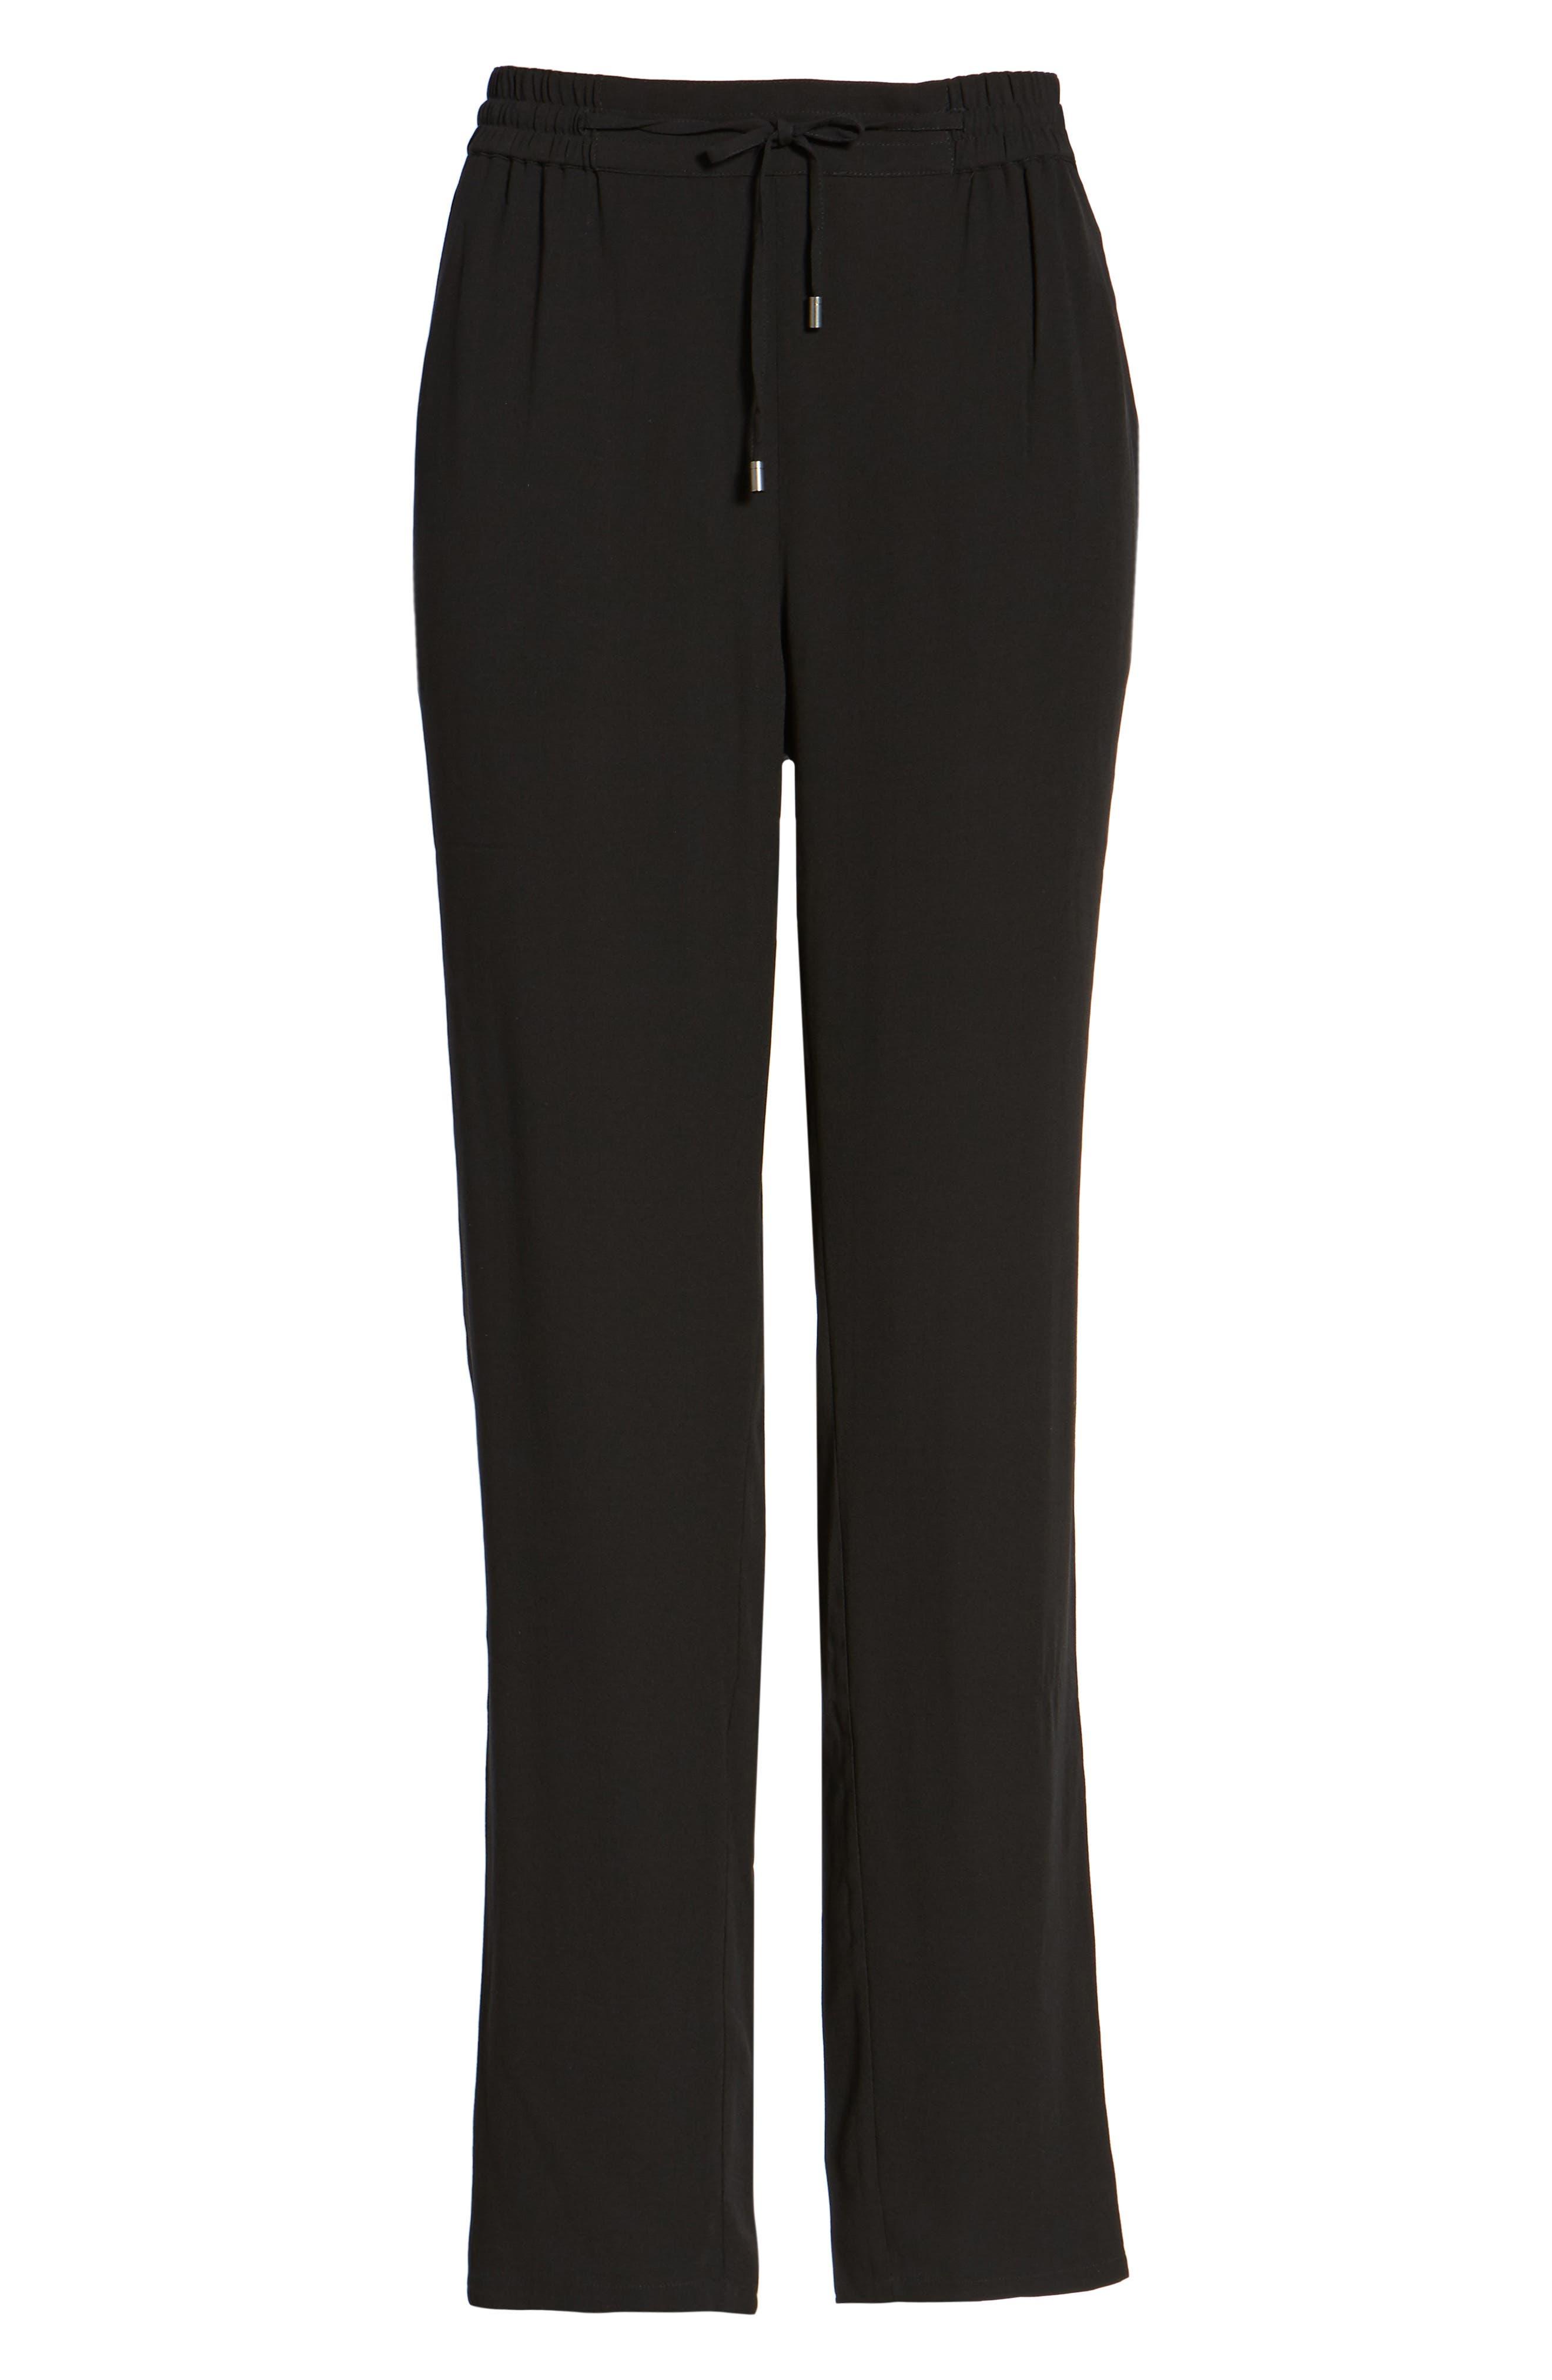 Silk Crepe Ankle Pants,                             Alternate thumbnail 2, color,                             001